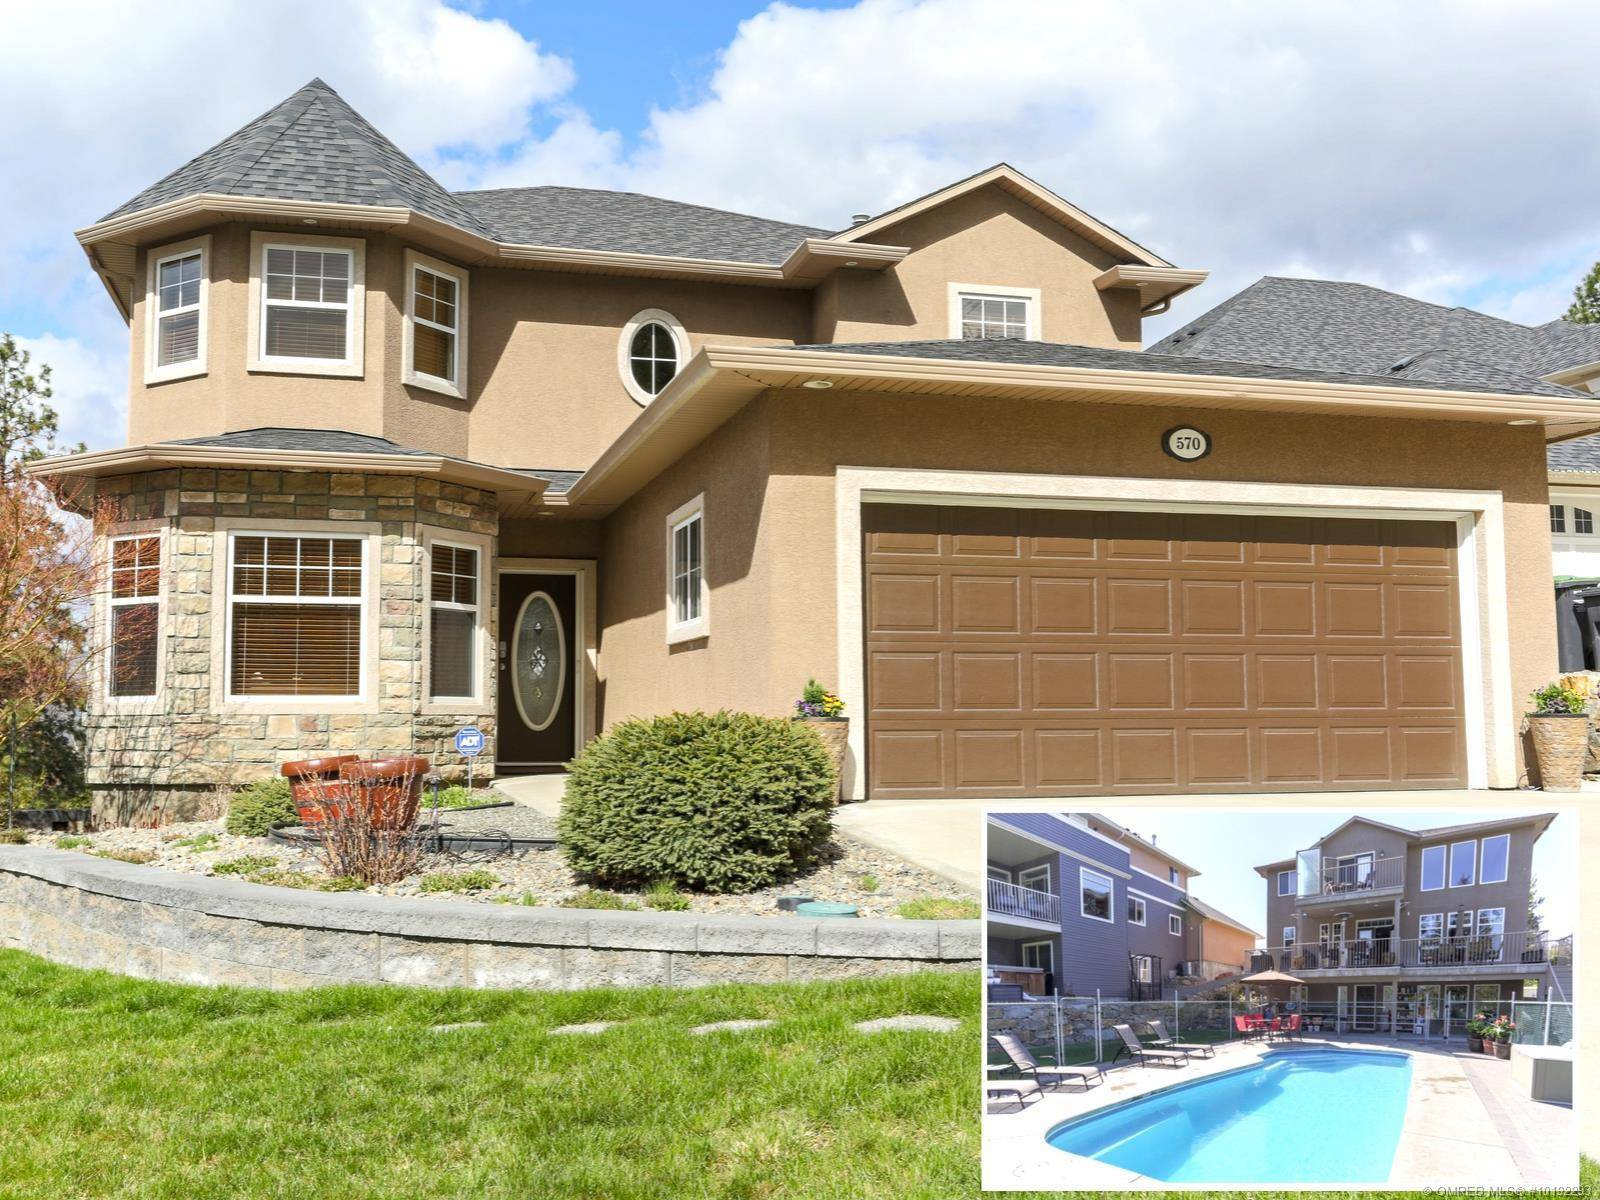 House for sale at 570 Vintage Terrace Rd Kelowna British Columbia - MLS: 10192293